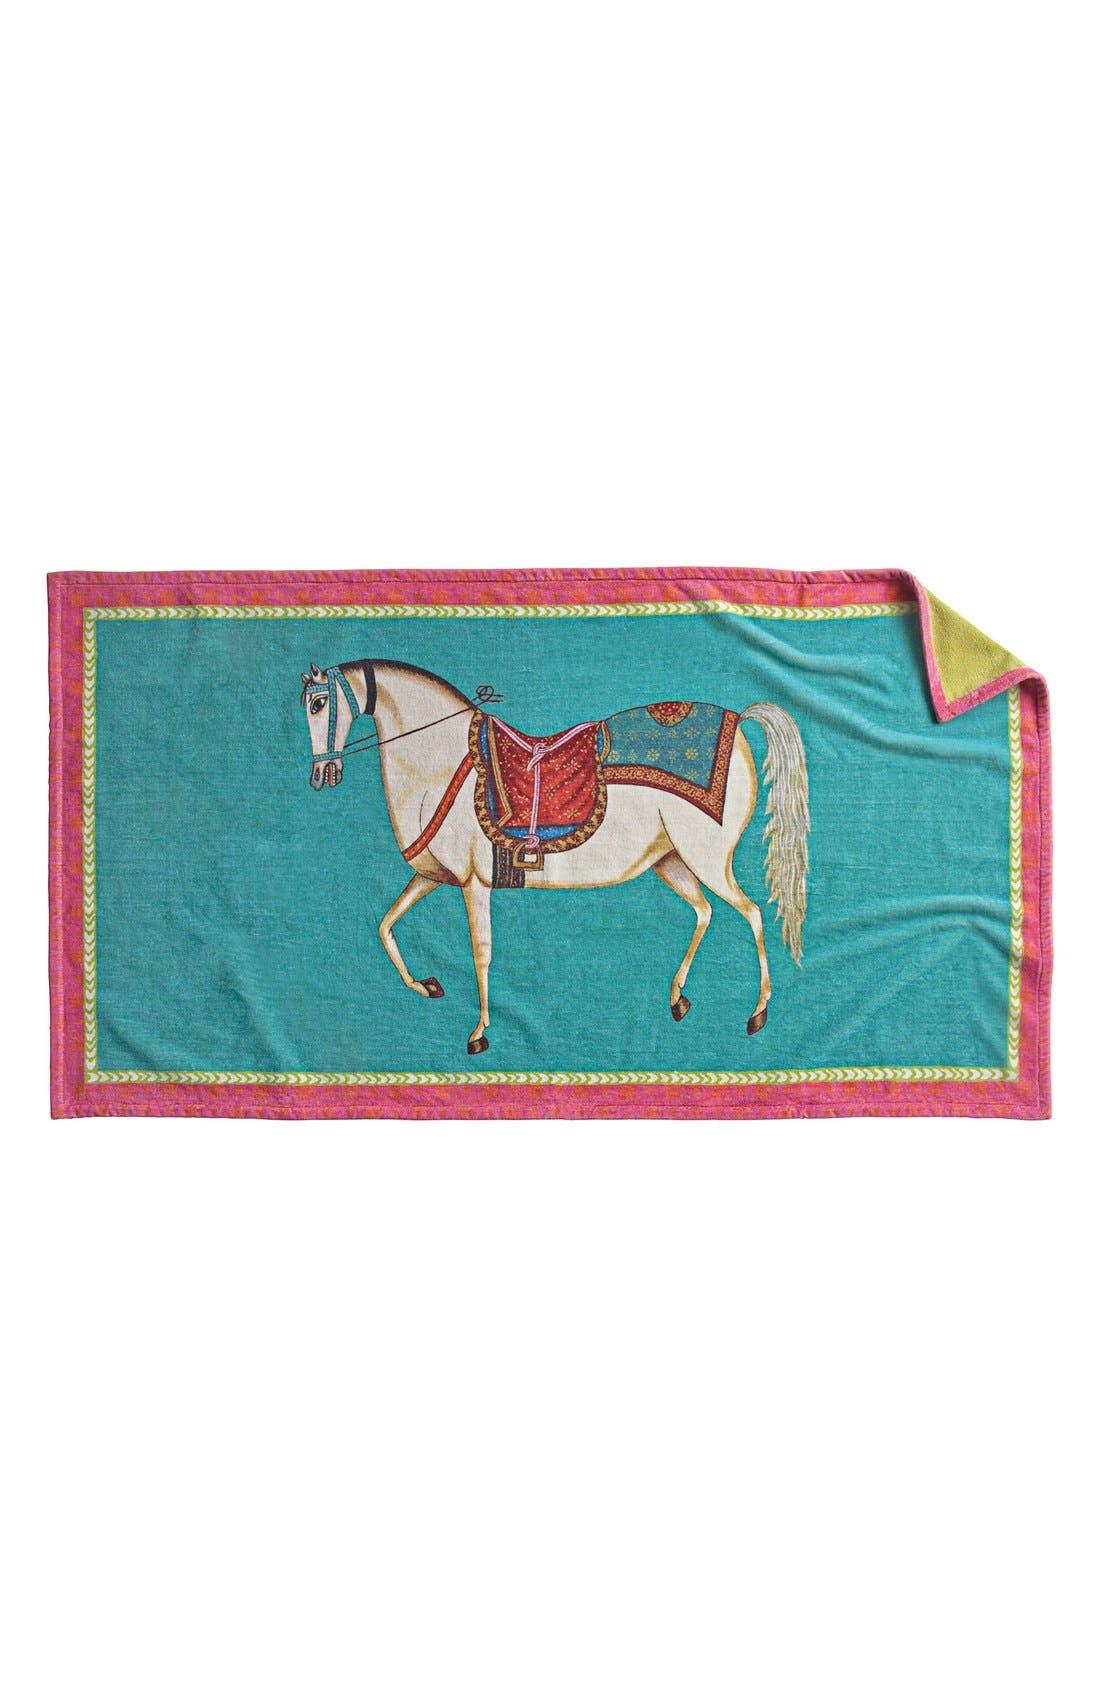 Alternate Image 1 Selected - John Robshaw 'Horse' Beach Towel